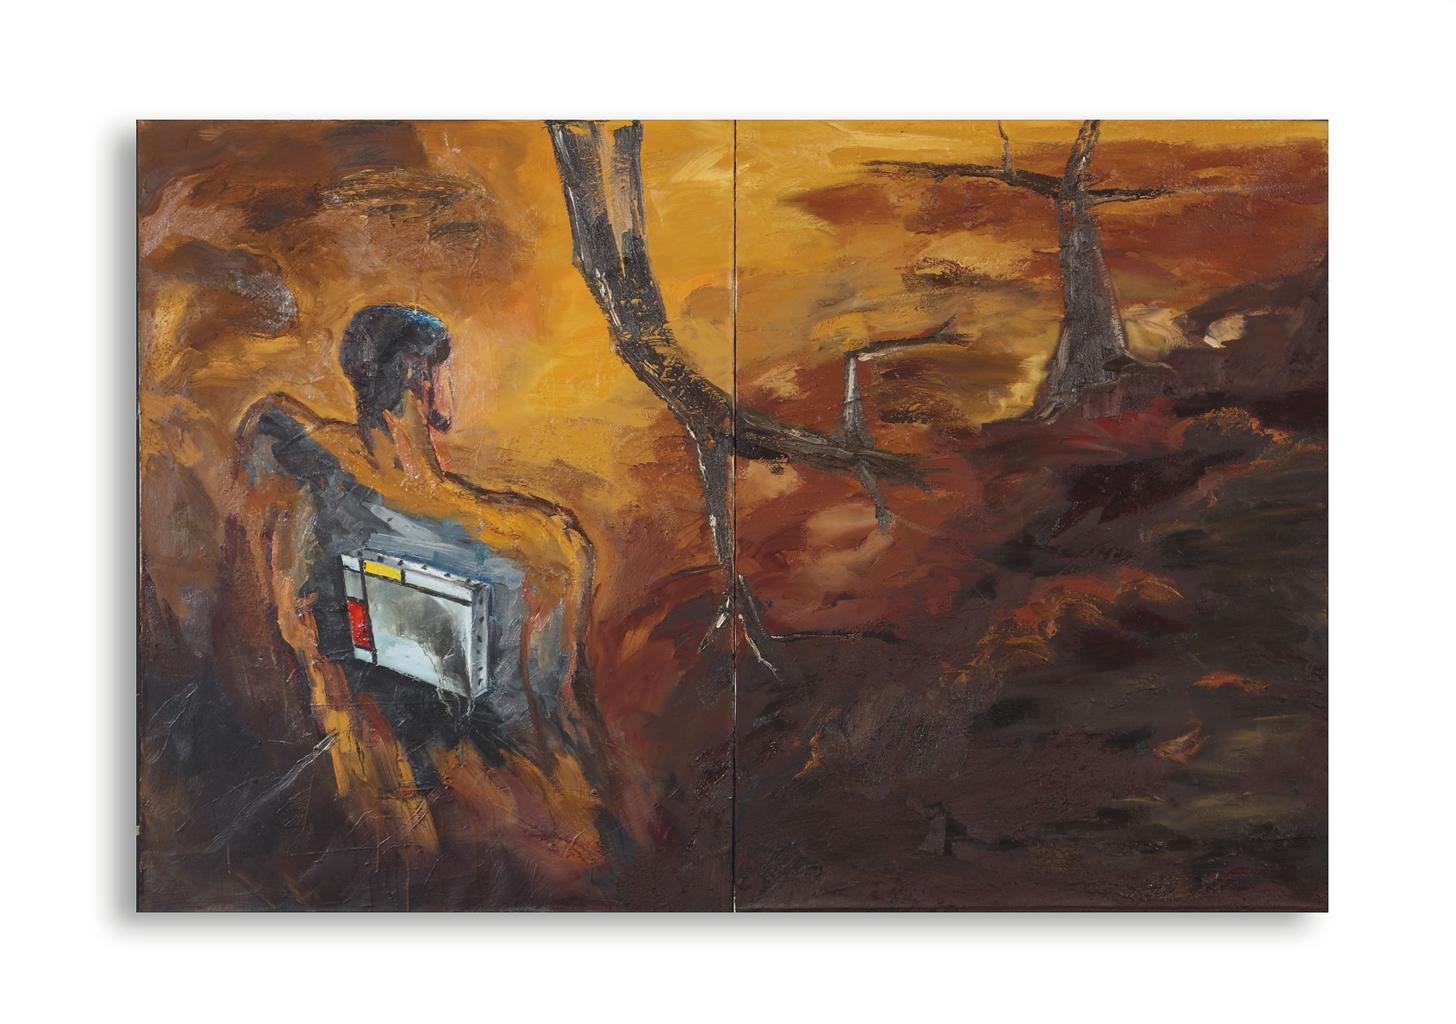 Volker Tannert-Untitled (Figur Mit Mondrian-Bild) (Figure With Mondrian Painting)-1984